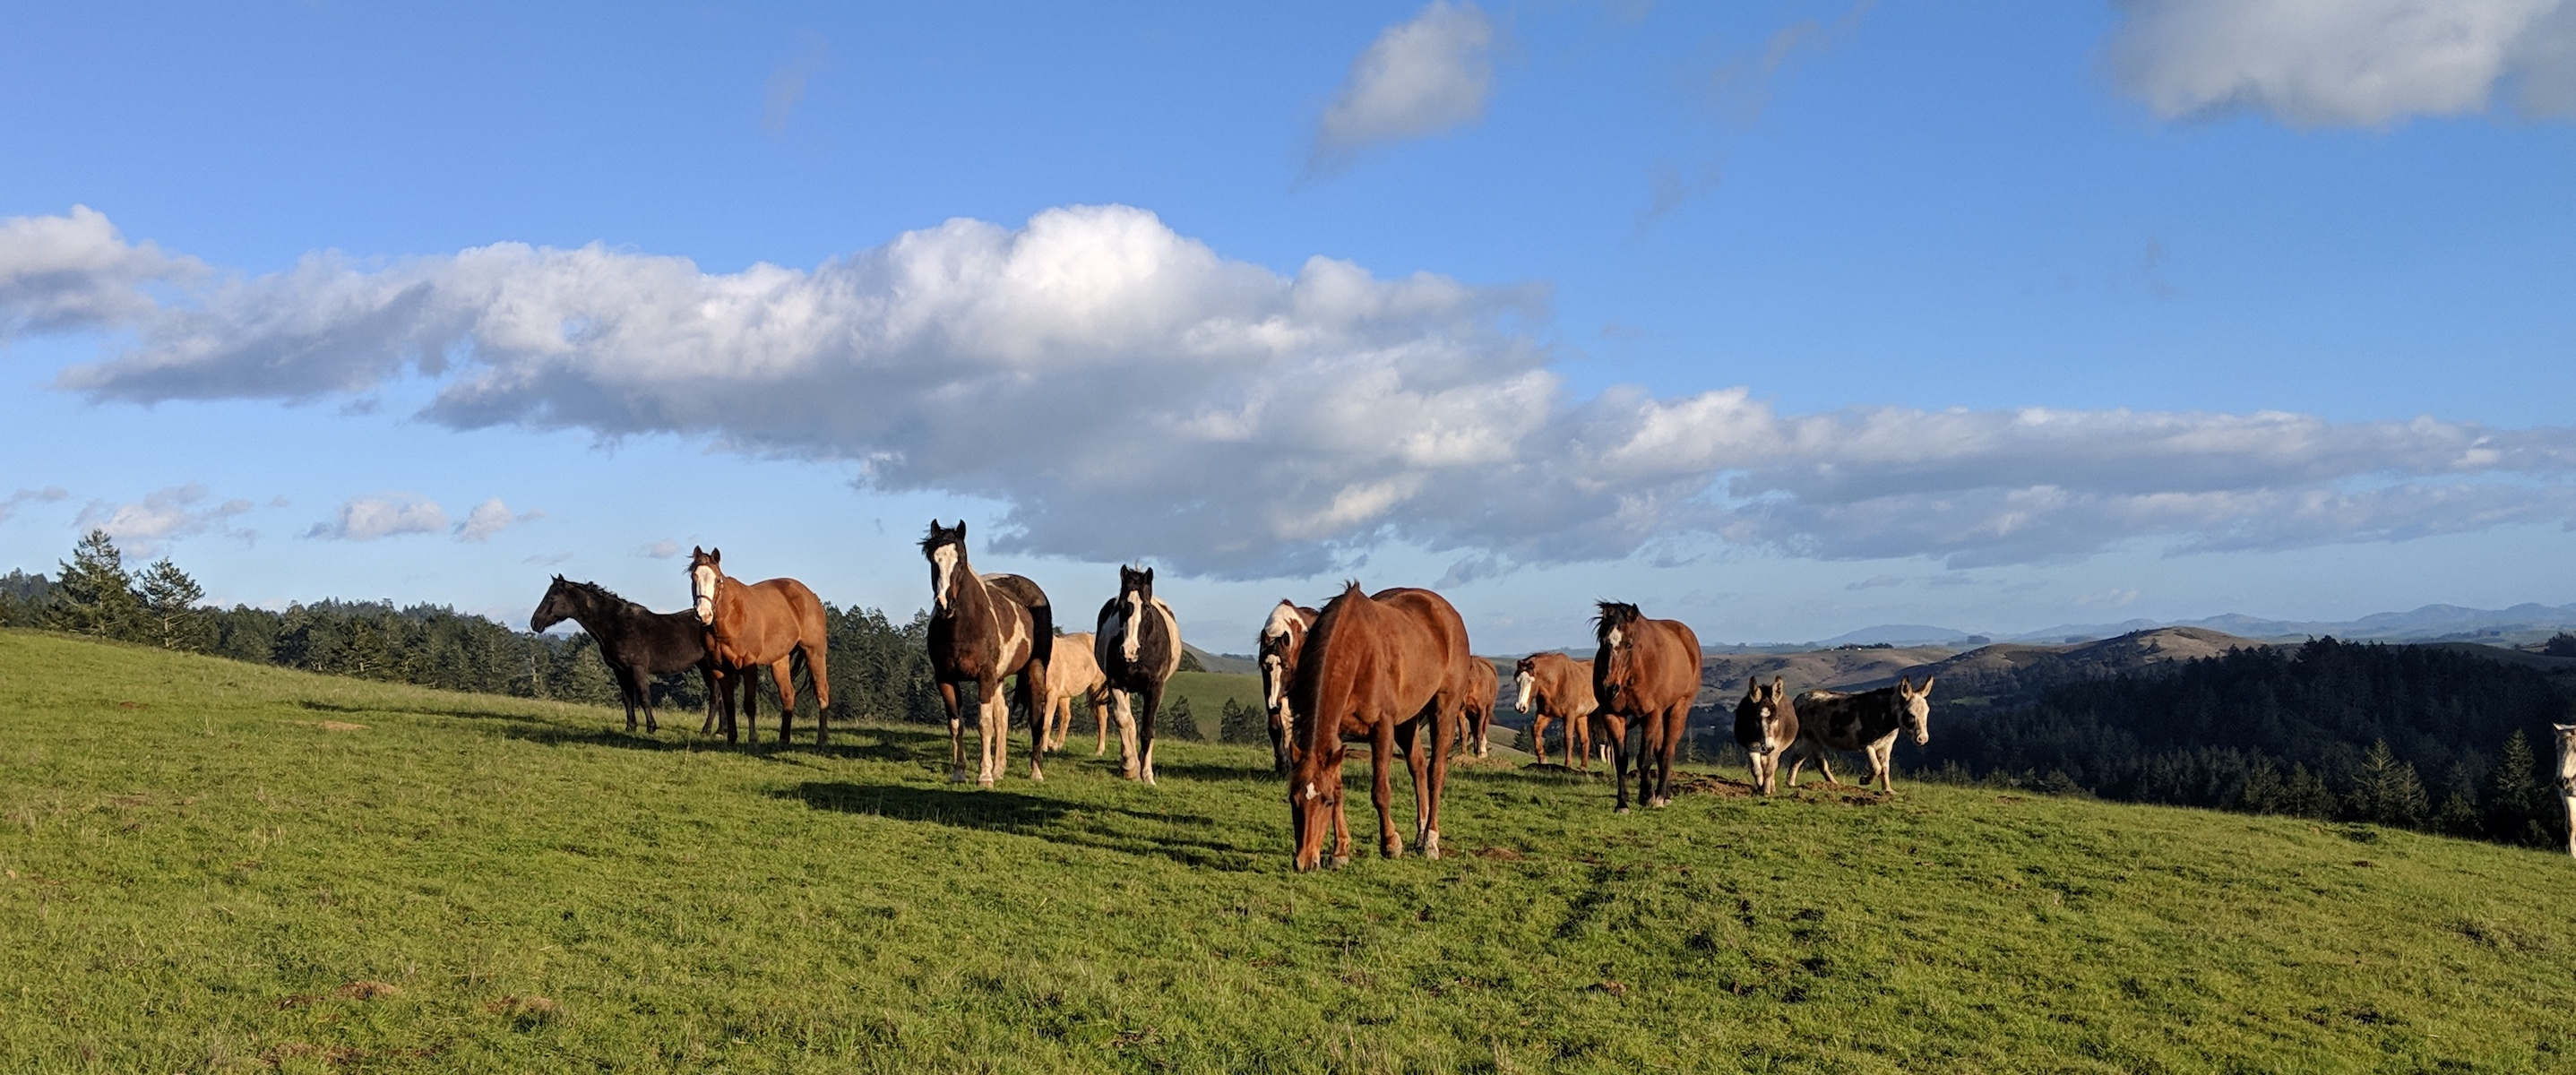 Horses Healing Humans